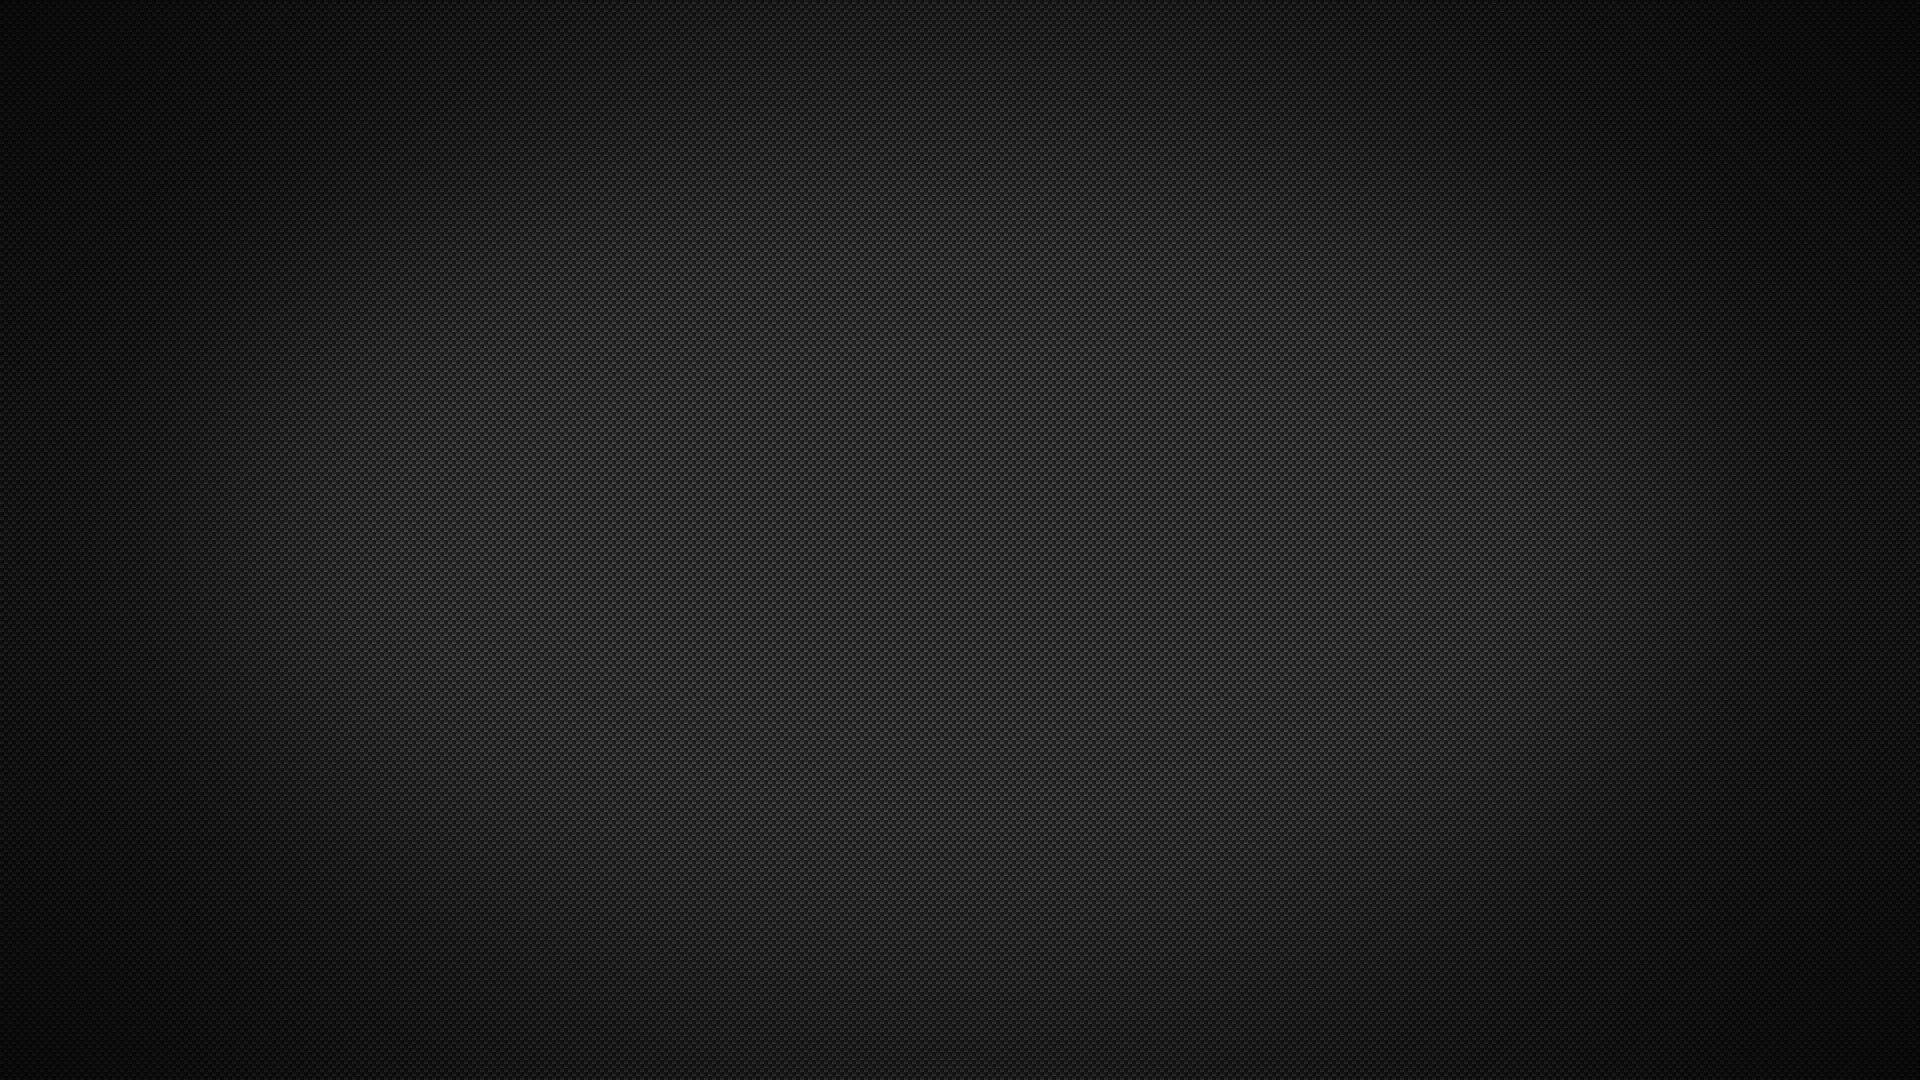 Carbon Wallpapers 1080p - Wallpaper Cave